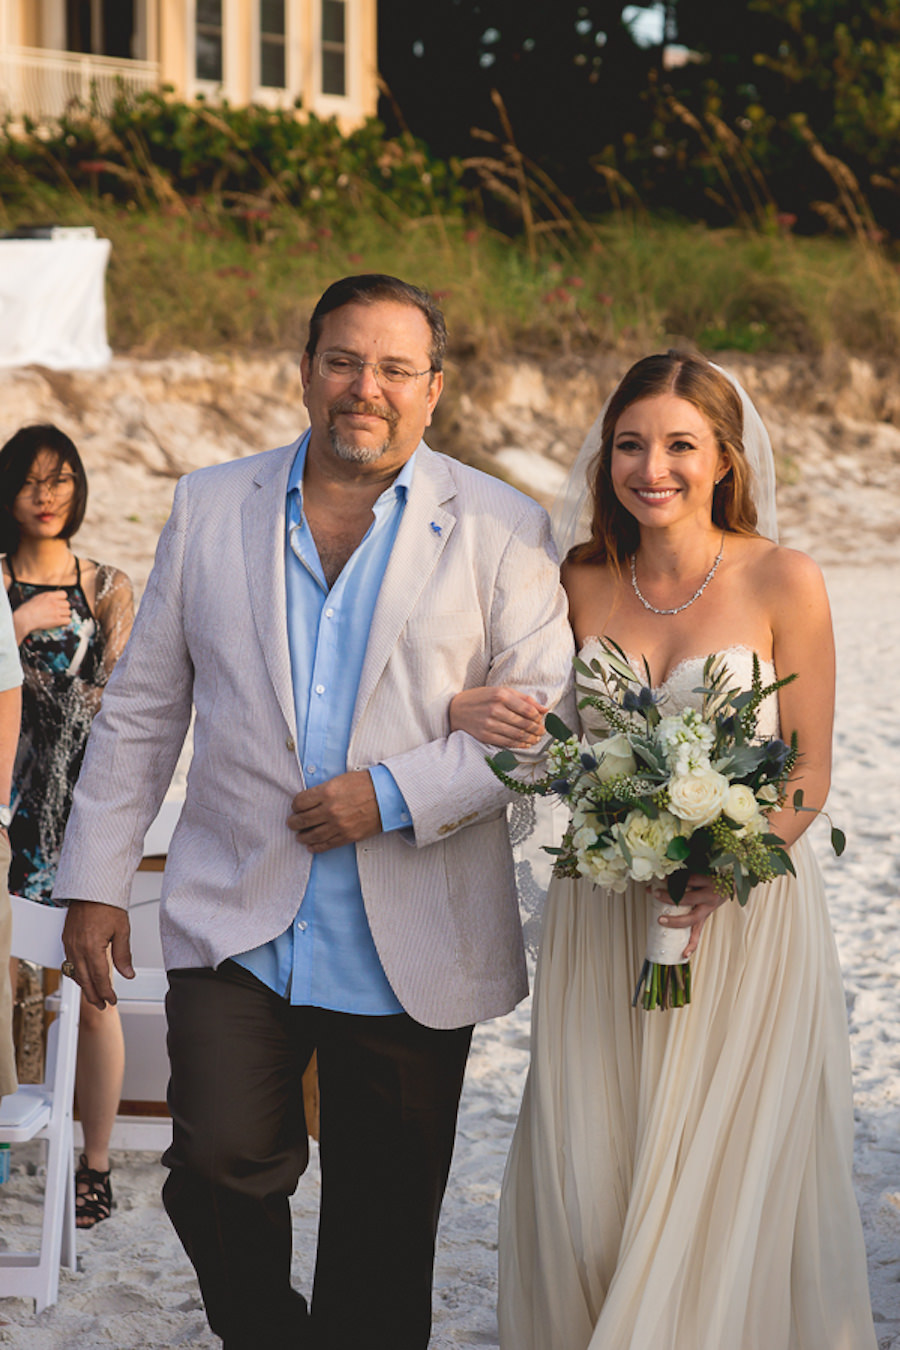 Outdoor Florida Beach Waterfront Bride Walking Down Aisle